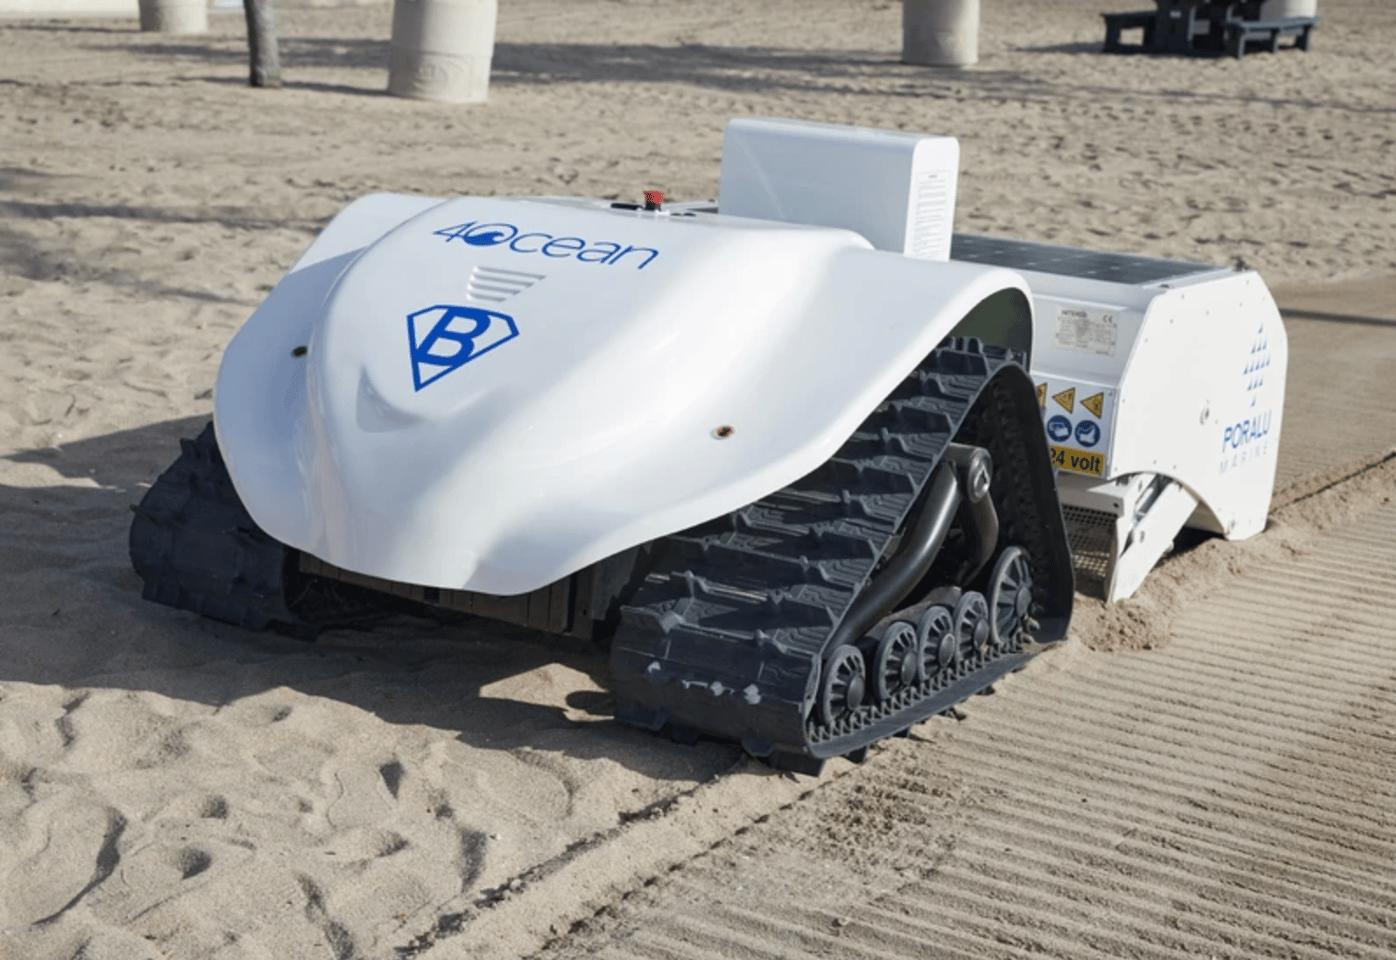 The BeBot was built by marine infrastructure manufacturer Poralu Marine